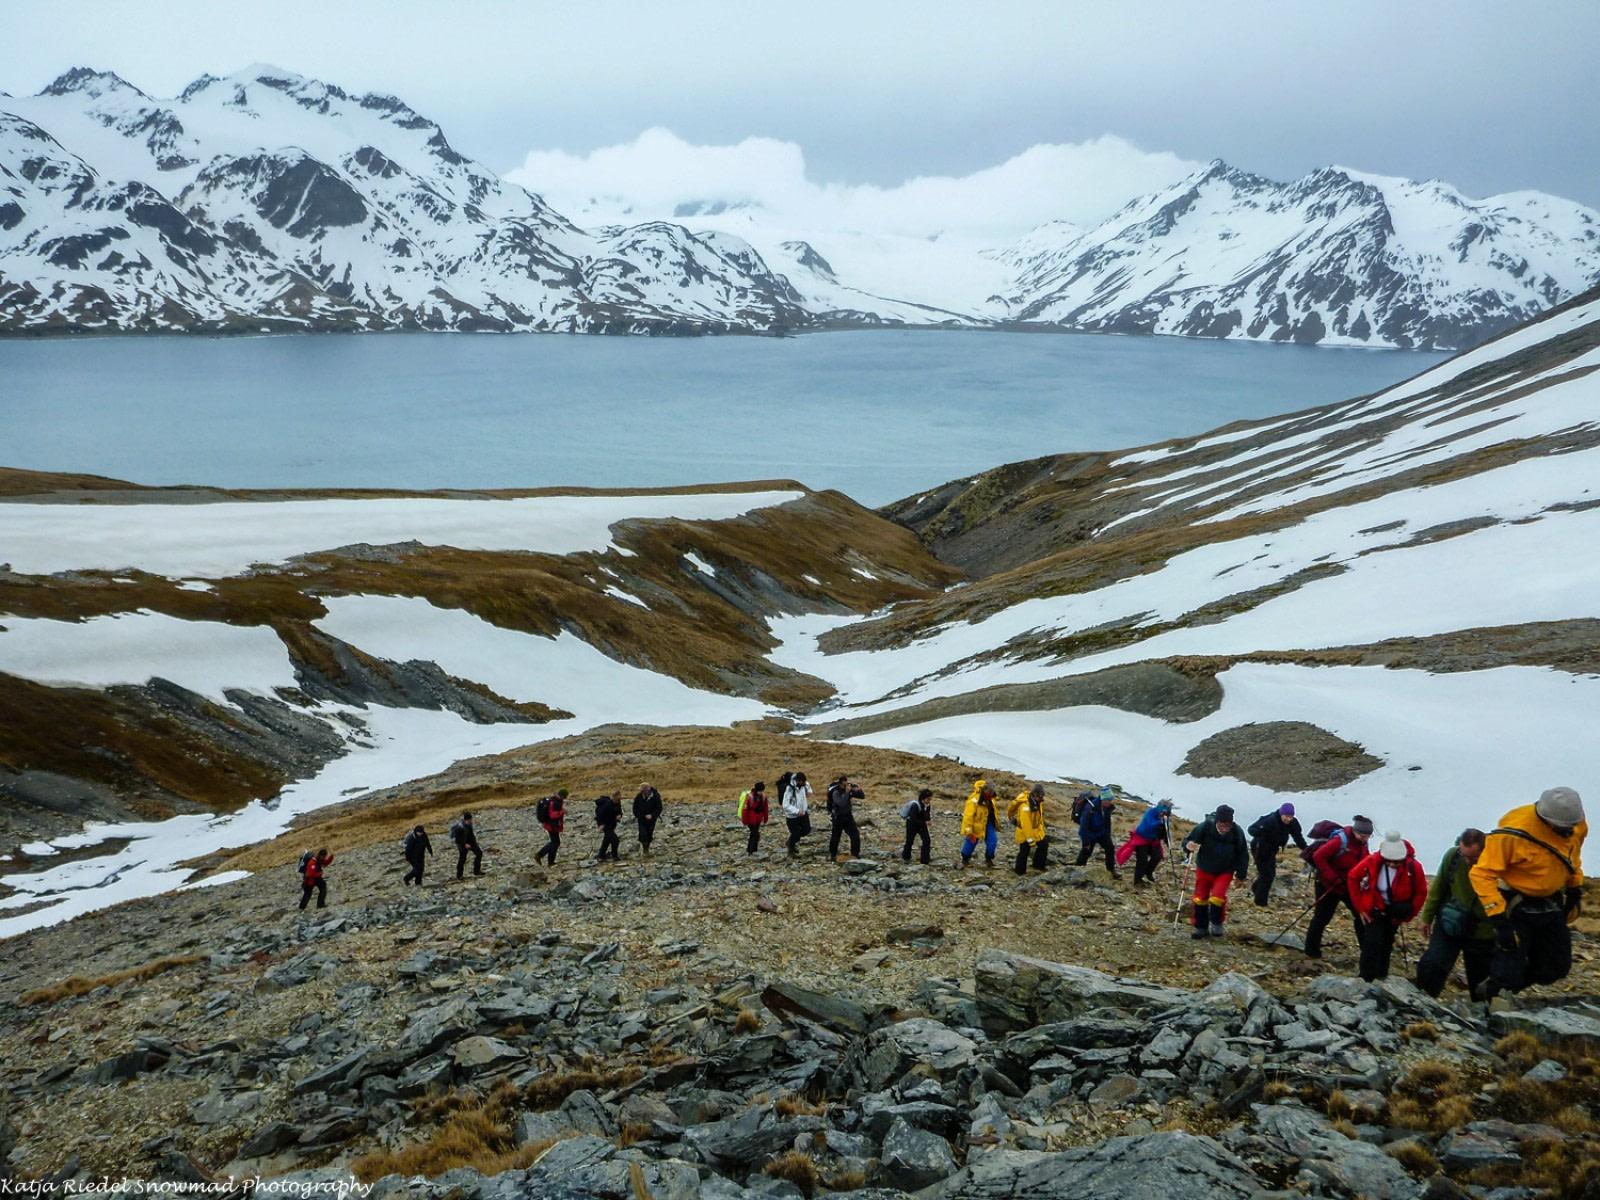 Shackleton route